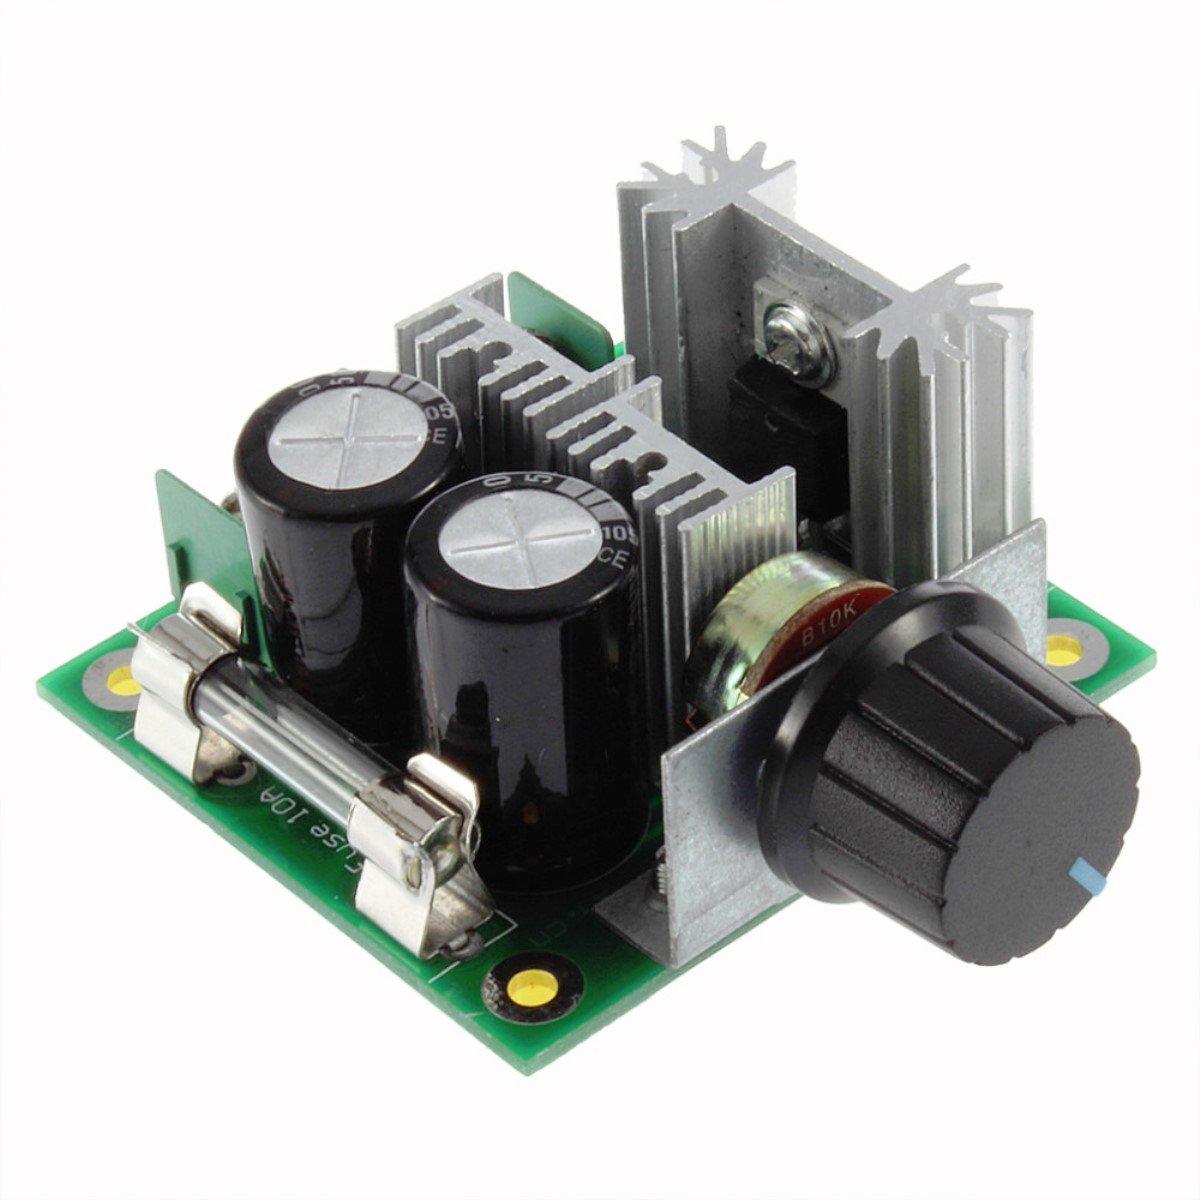 Robodo MO39 DC Motor Speed Control Regulator Pulse PWM 12V-40V 10A (B0787FVBTT) Amazon Price History, Amazon Price Tracker